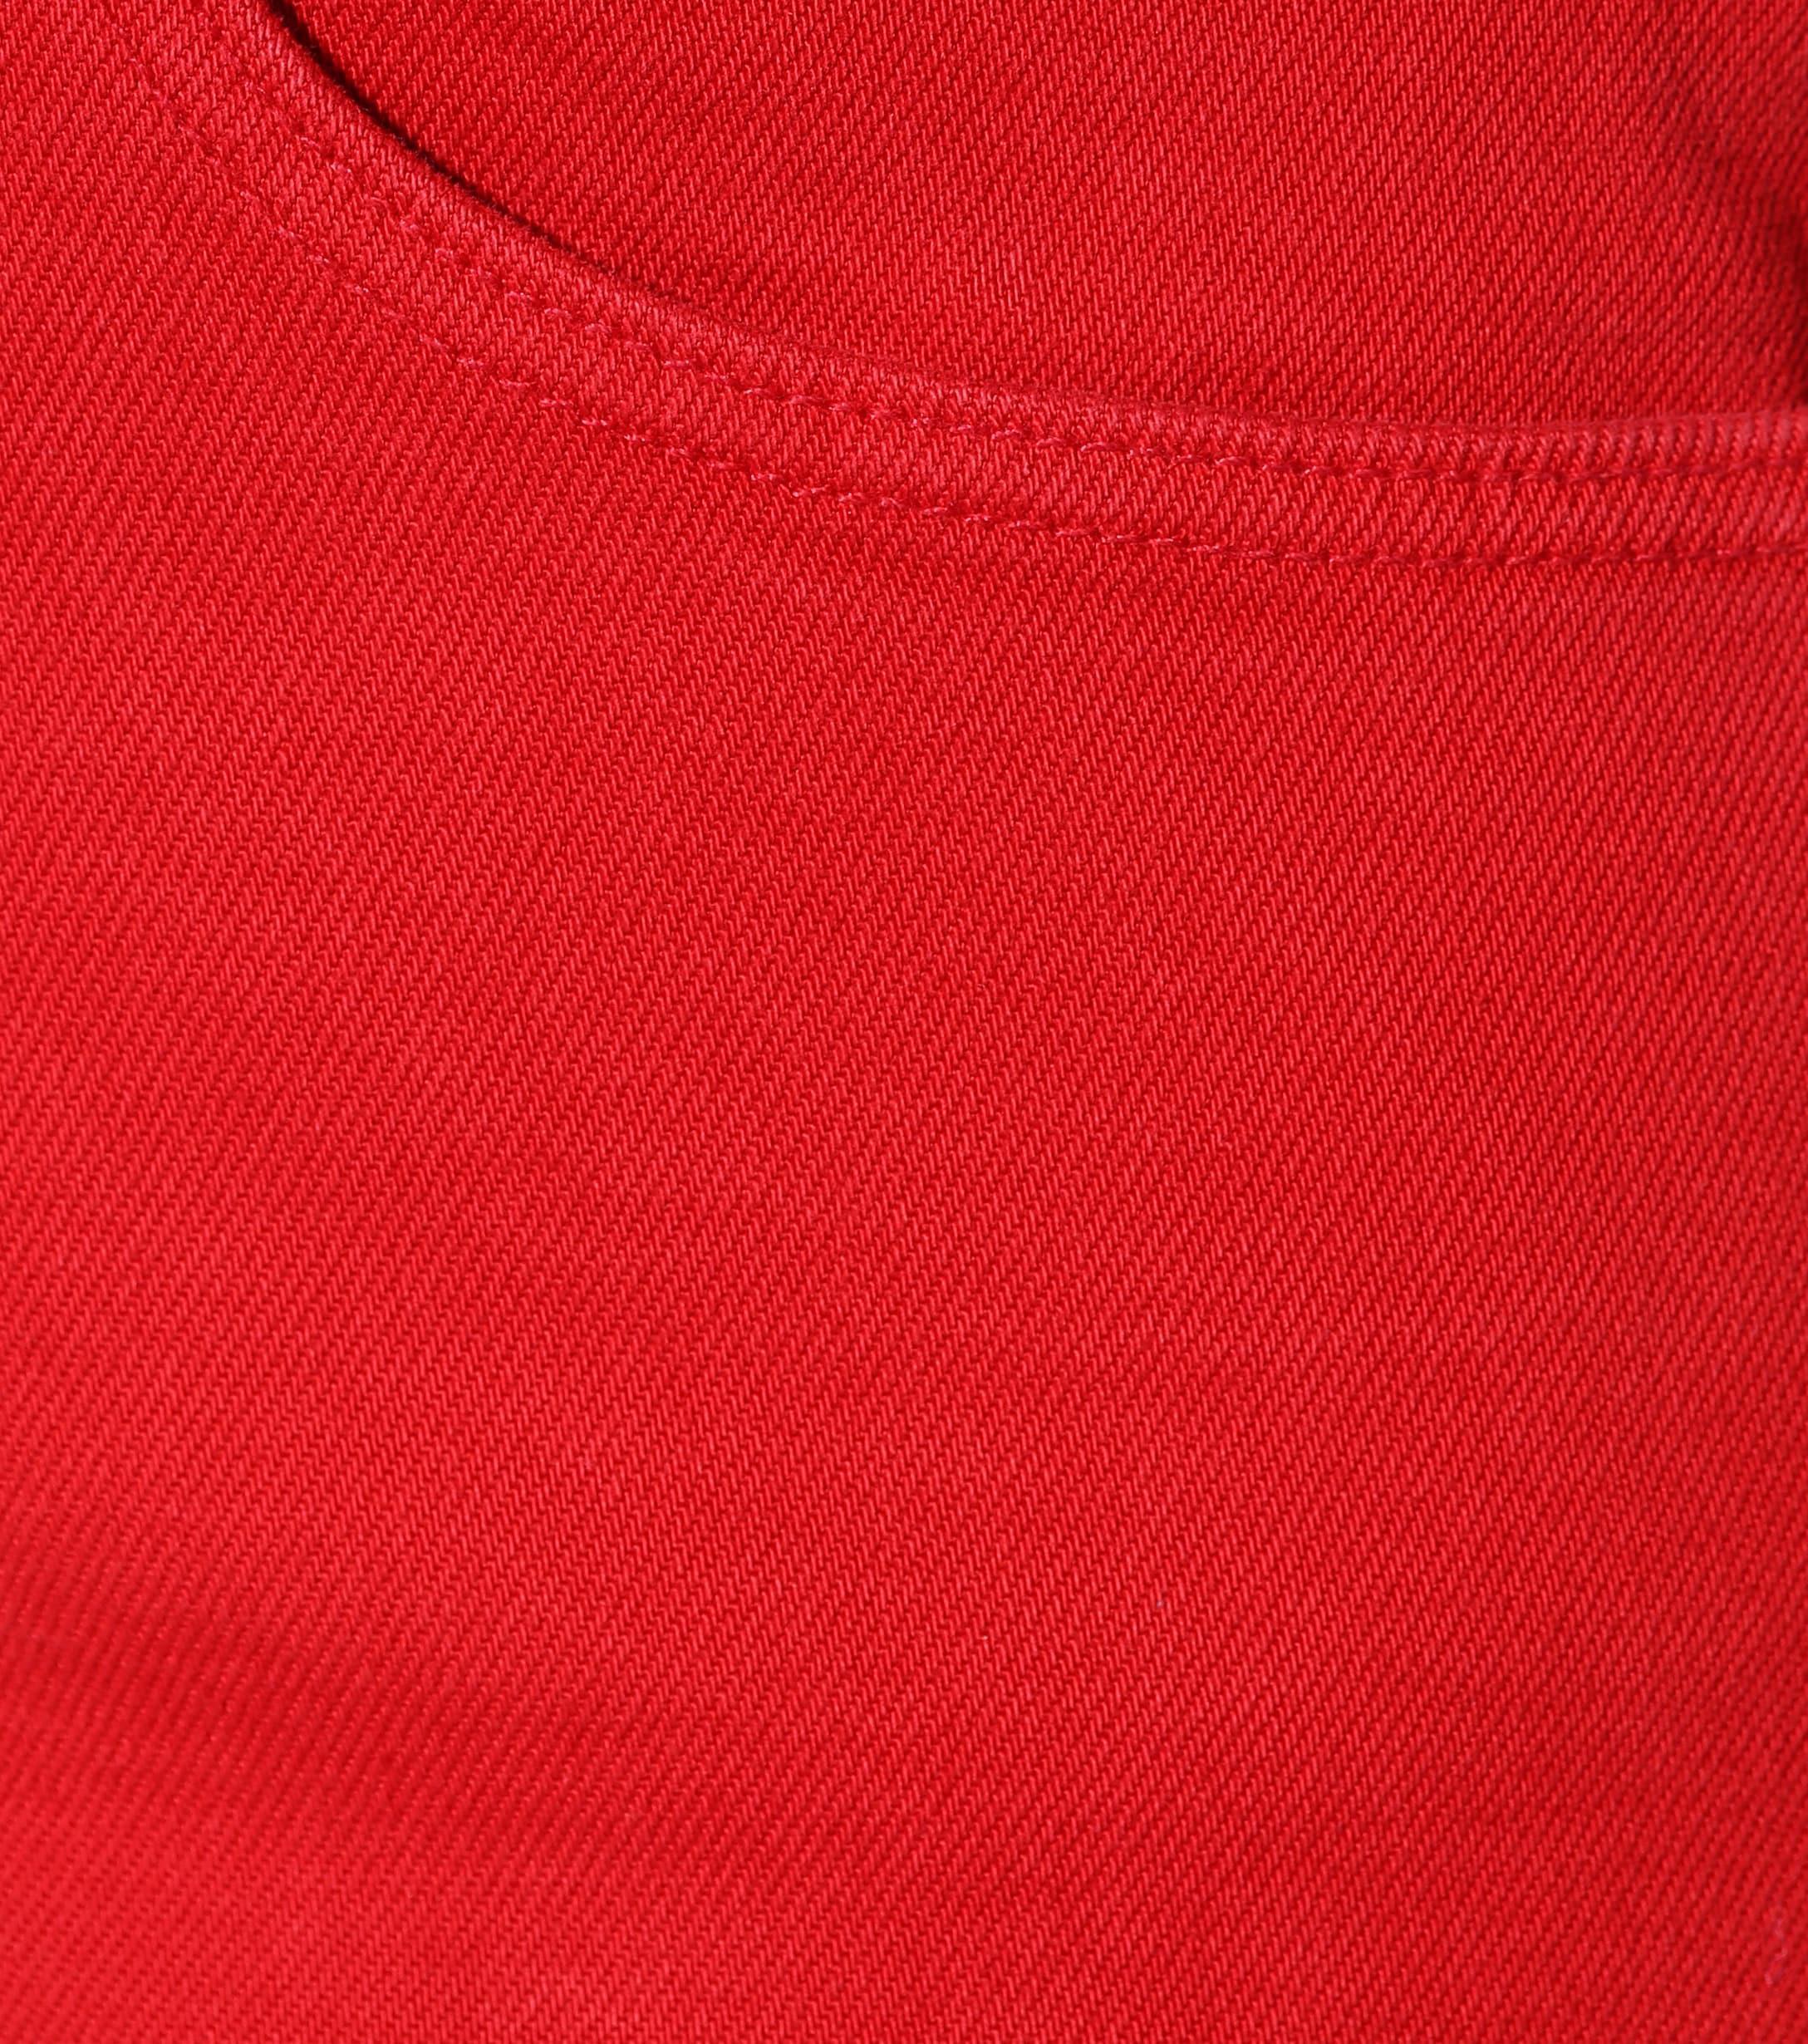 Jeans cropped pierna ancha W4 Shelter 3x1 de Denim de color Rojo